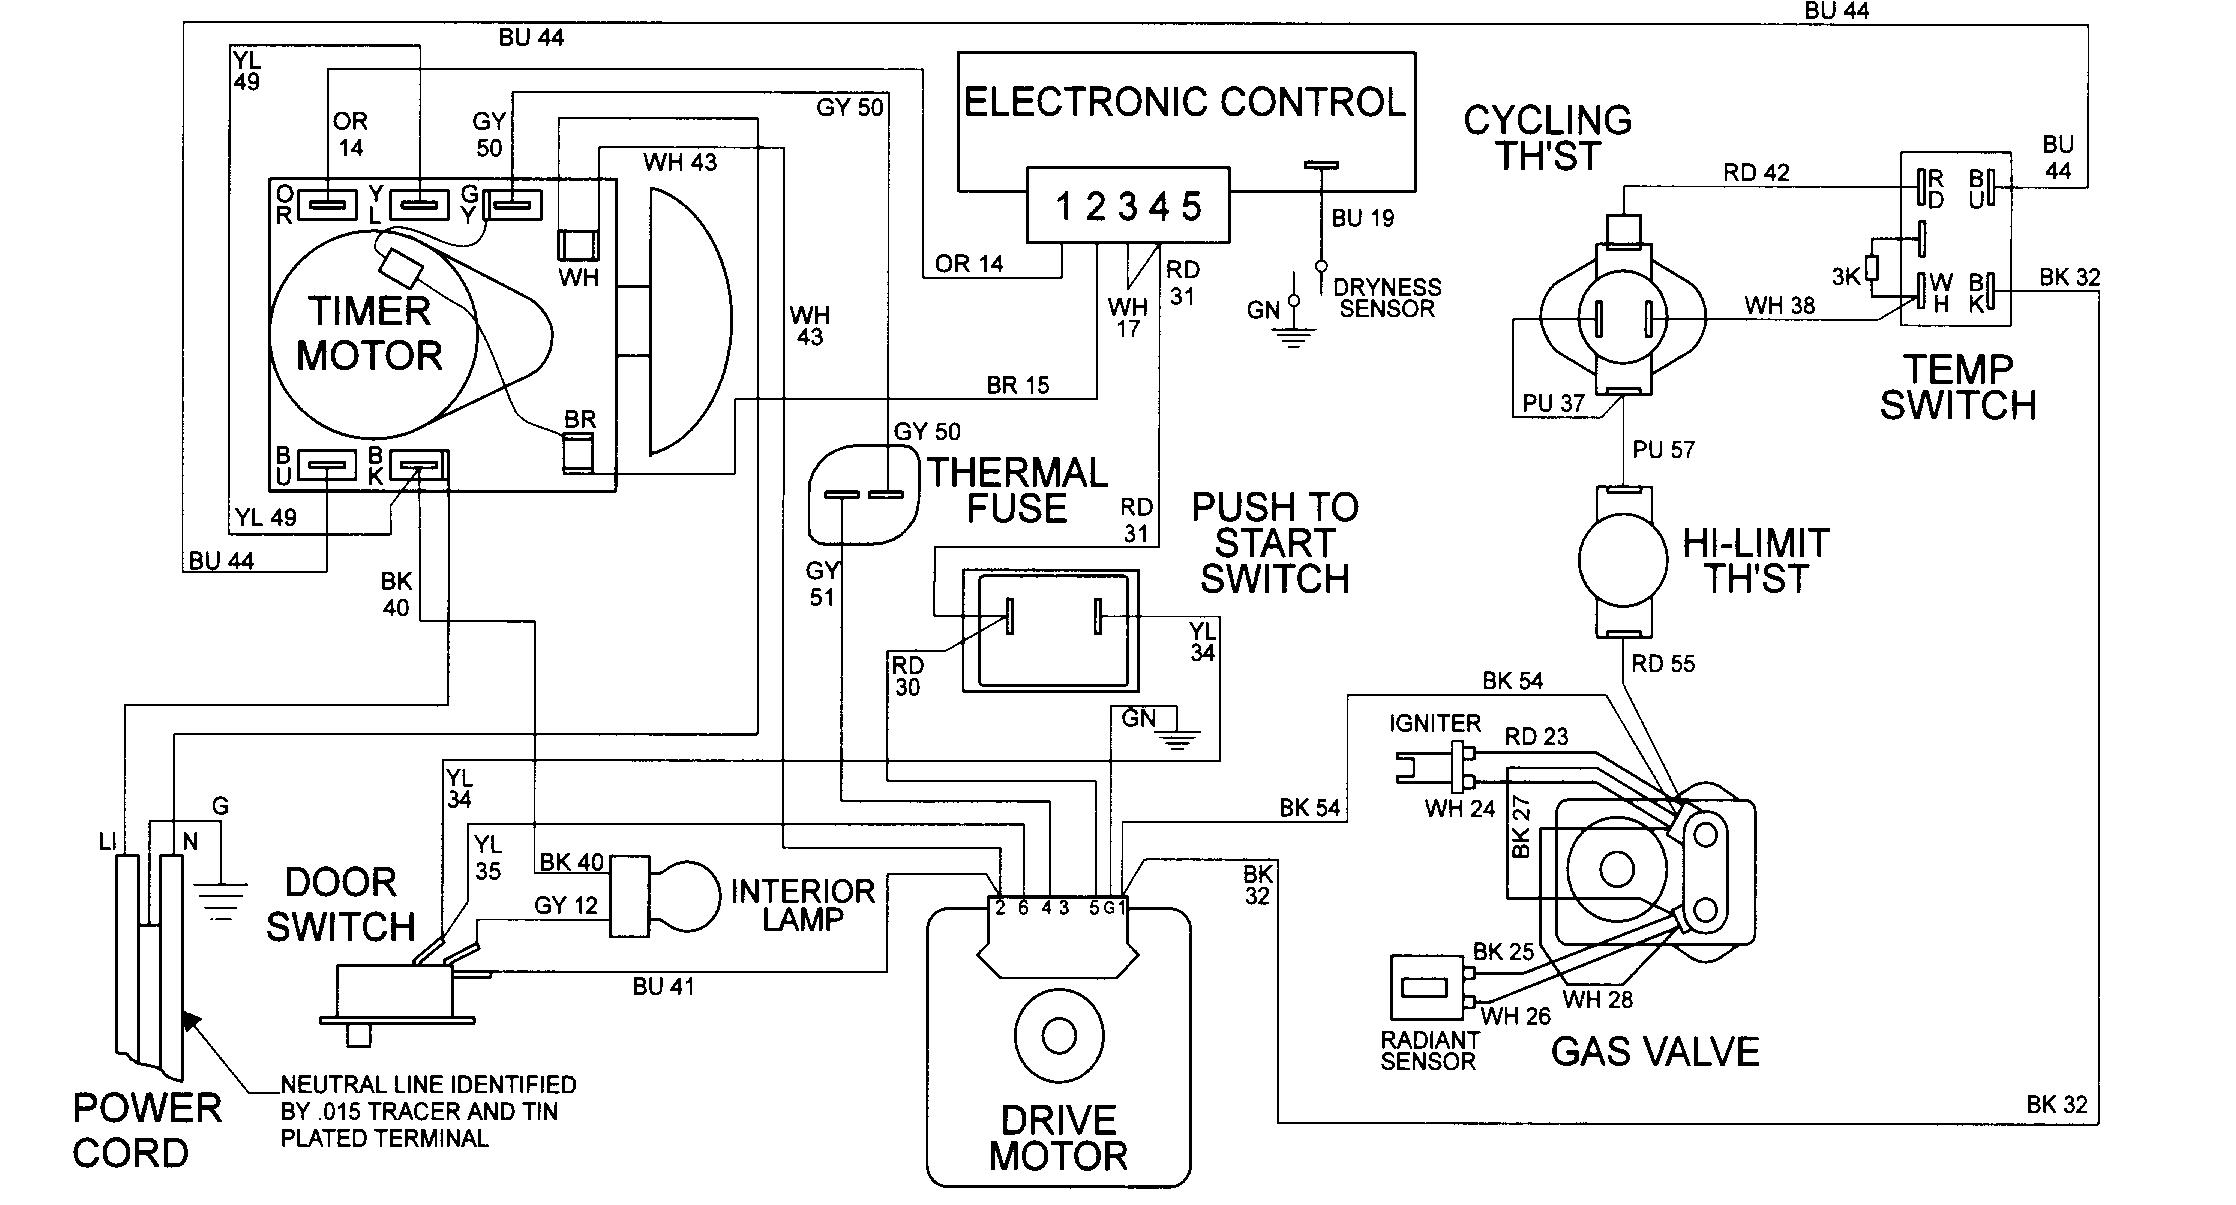 M0407320 00007?resize\\\\\\\=840%2C453 wiring diagram for dryer motor wiring diagrams maytag dryer motor wiring diagram at soozxer.org